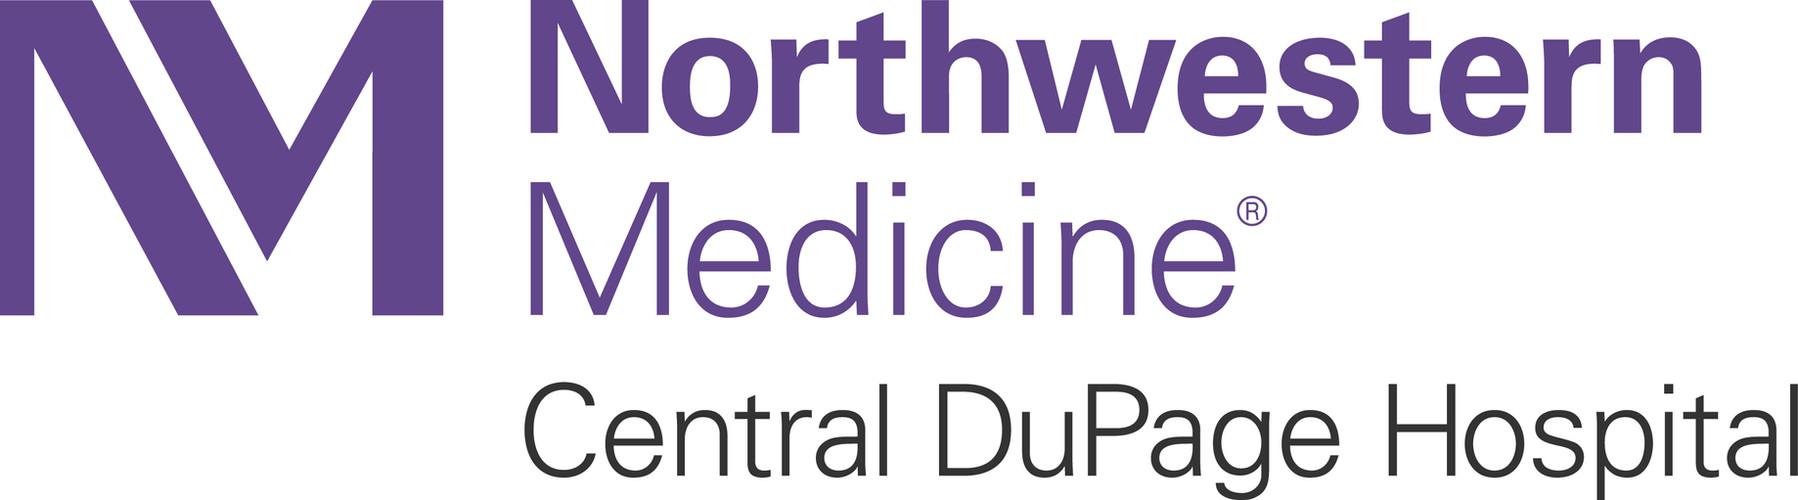 Northwestern Medice